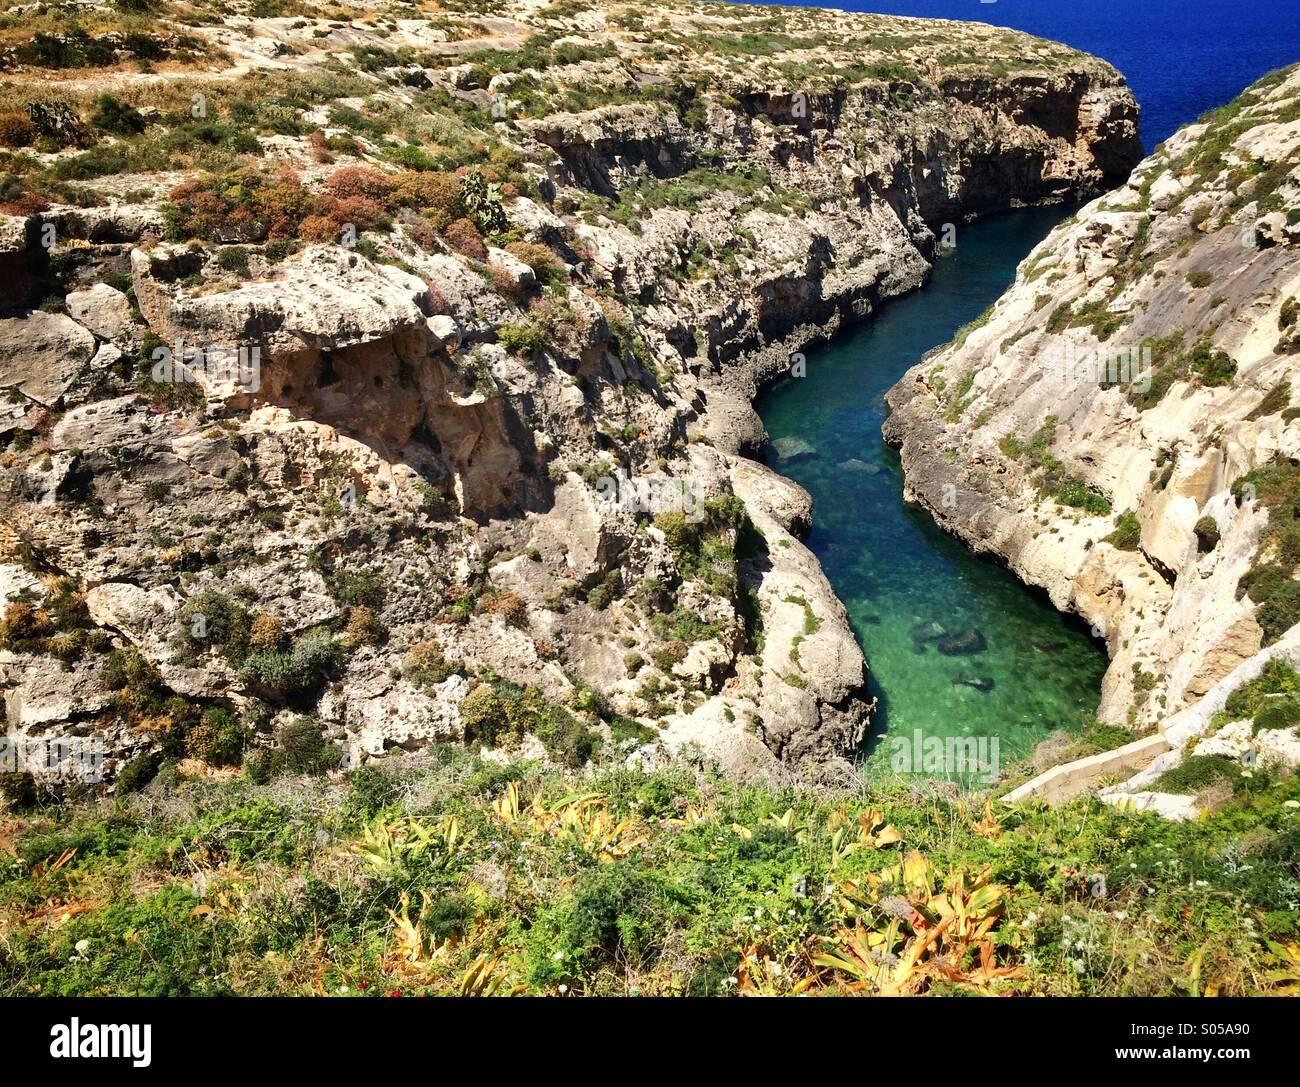 Wied Il-Ghasri Valley in Gozo, Malta - Stock Image